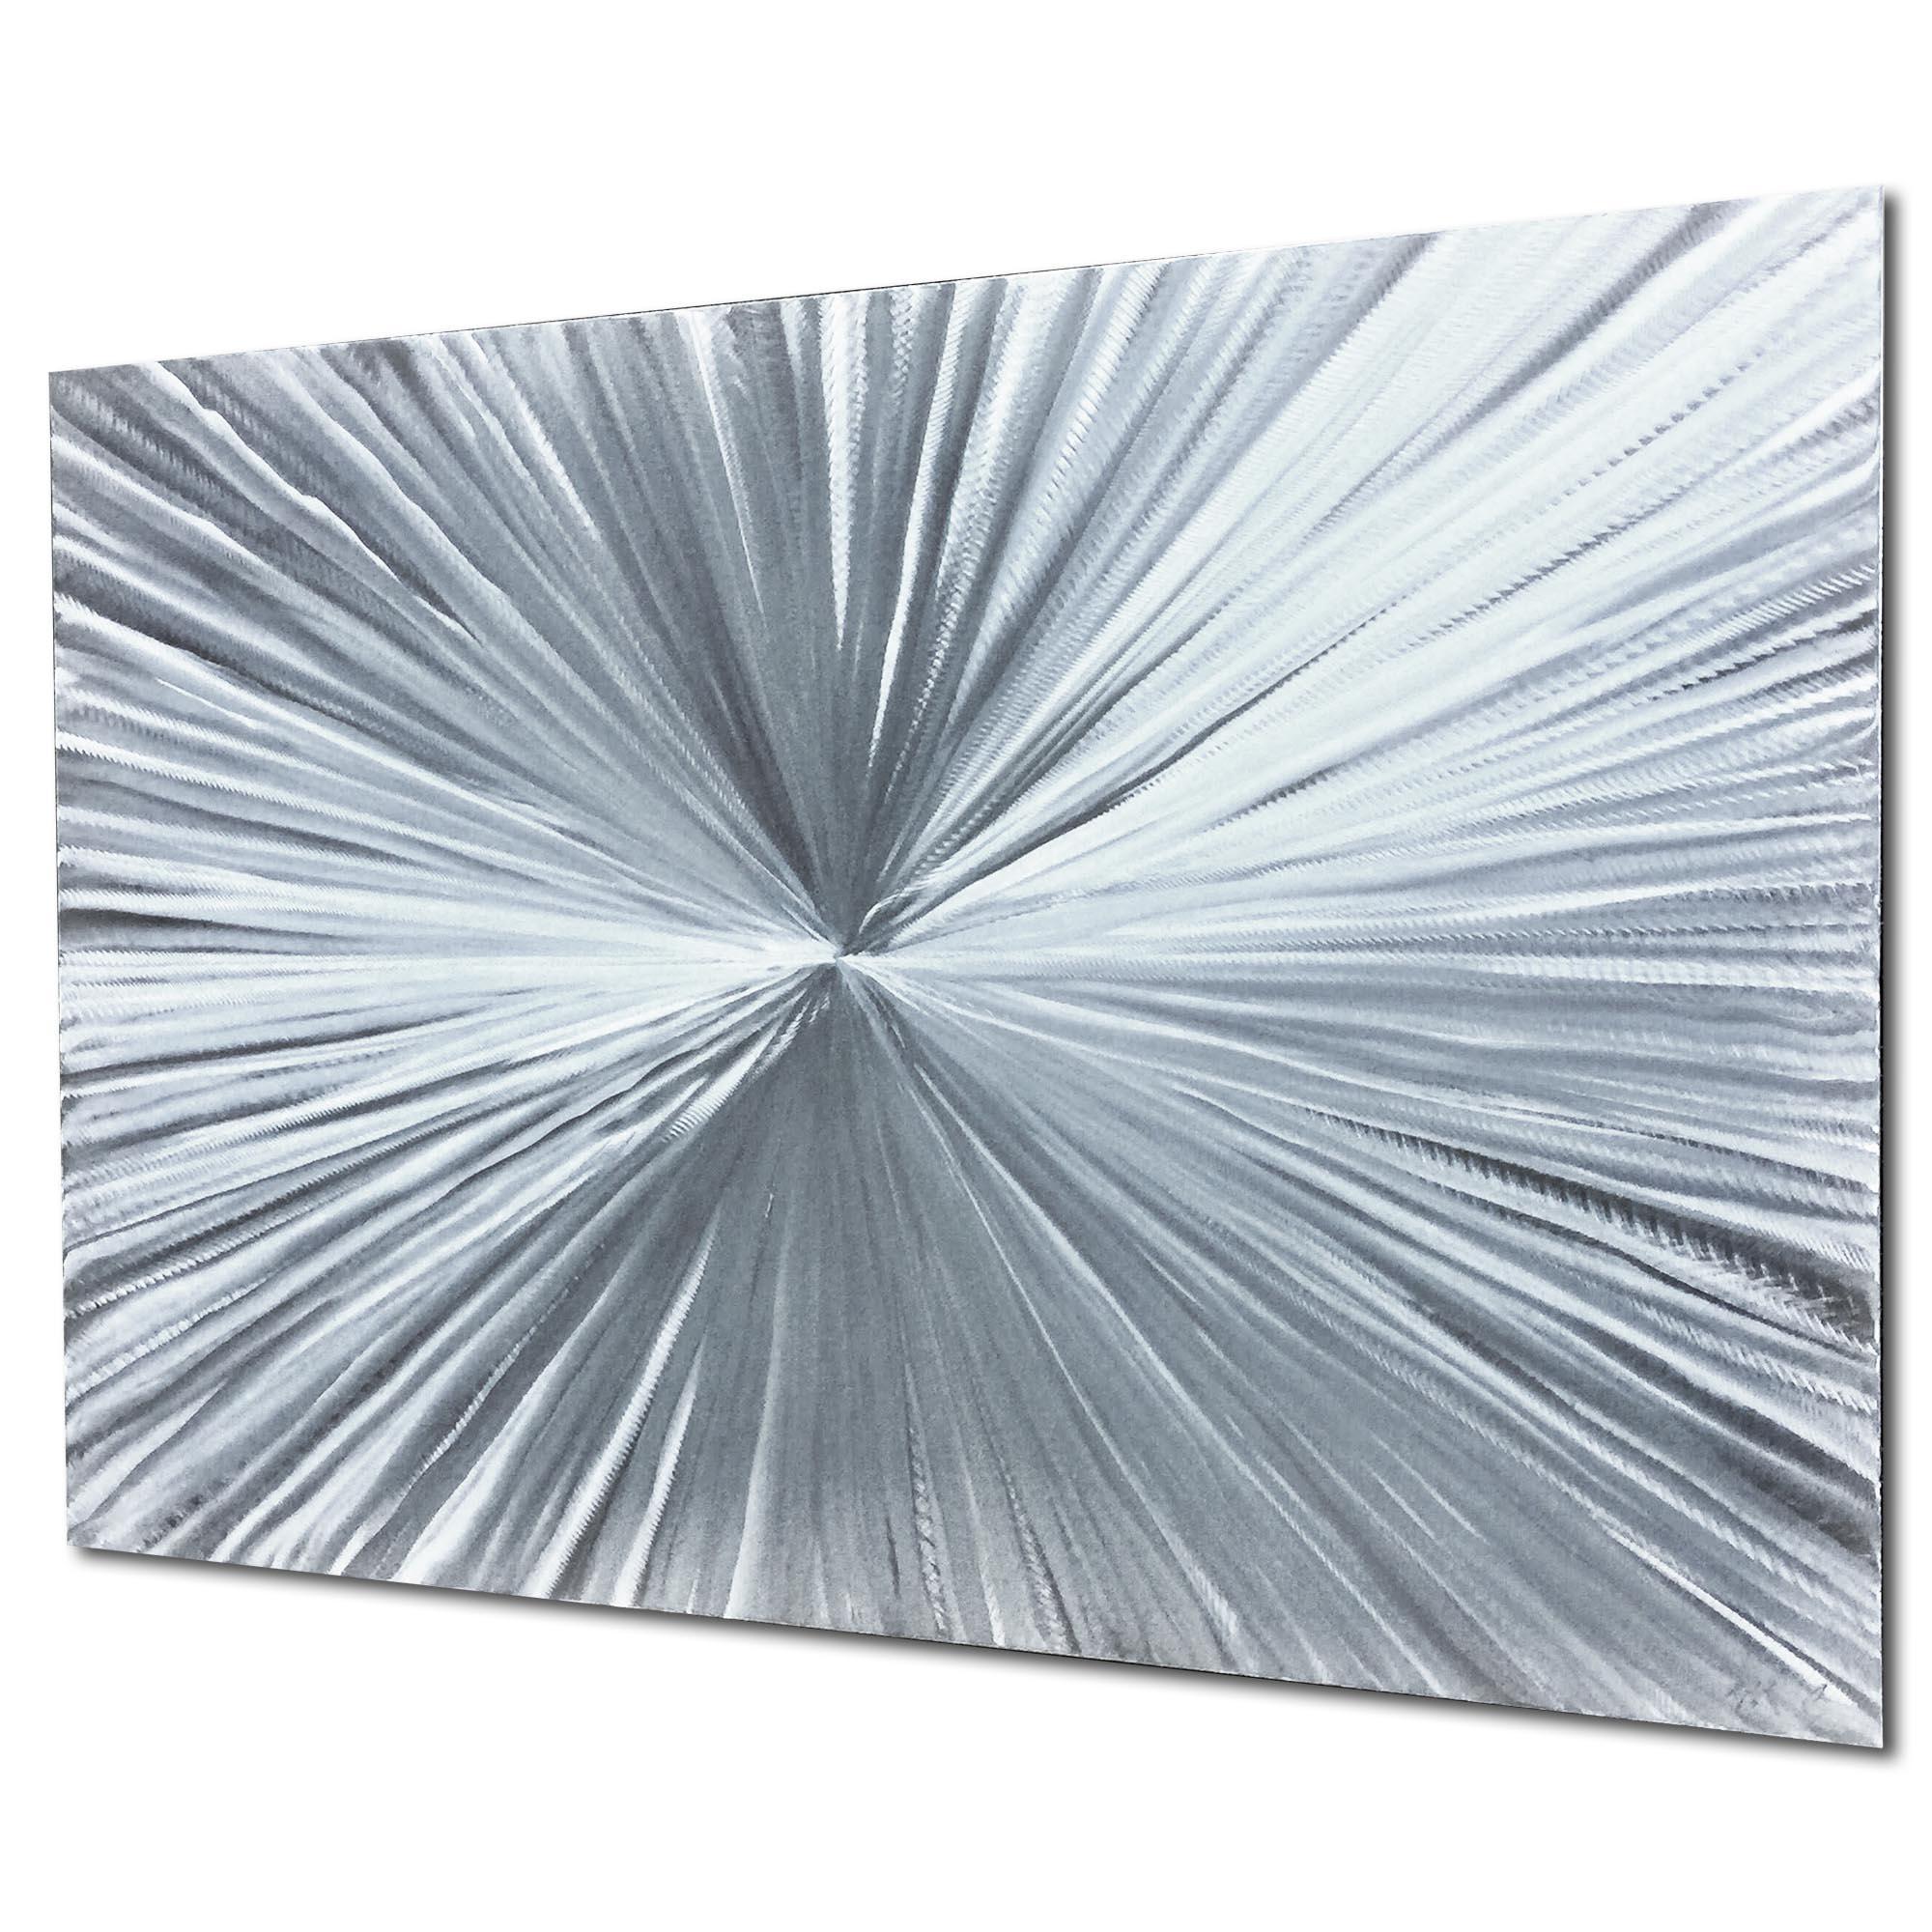 Bursting by Helena Martin - Sunburst Metal Art on Natural Aluminum - Image 2